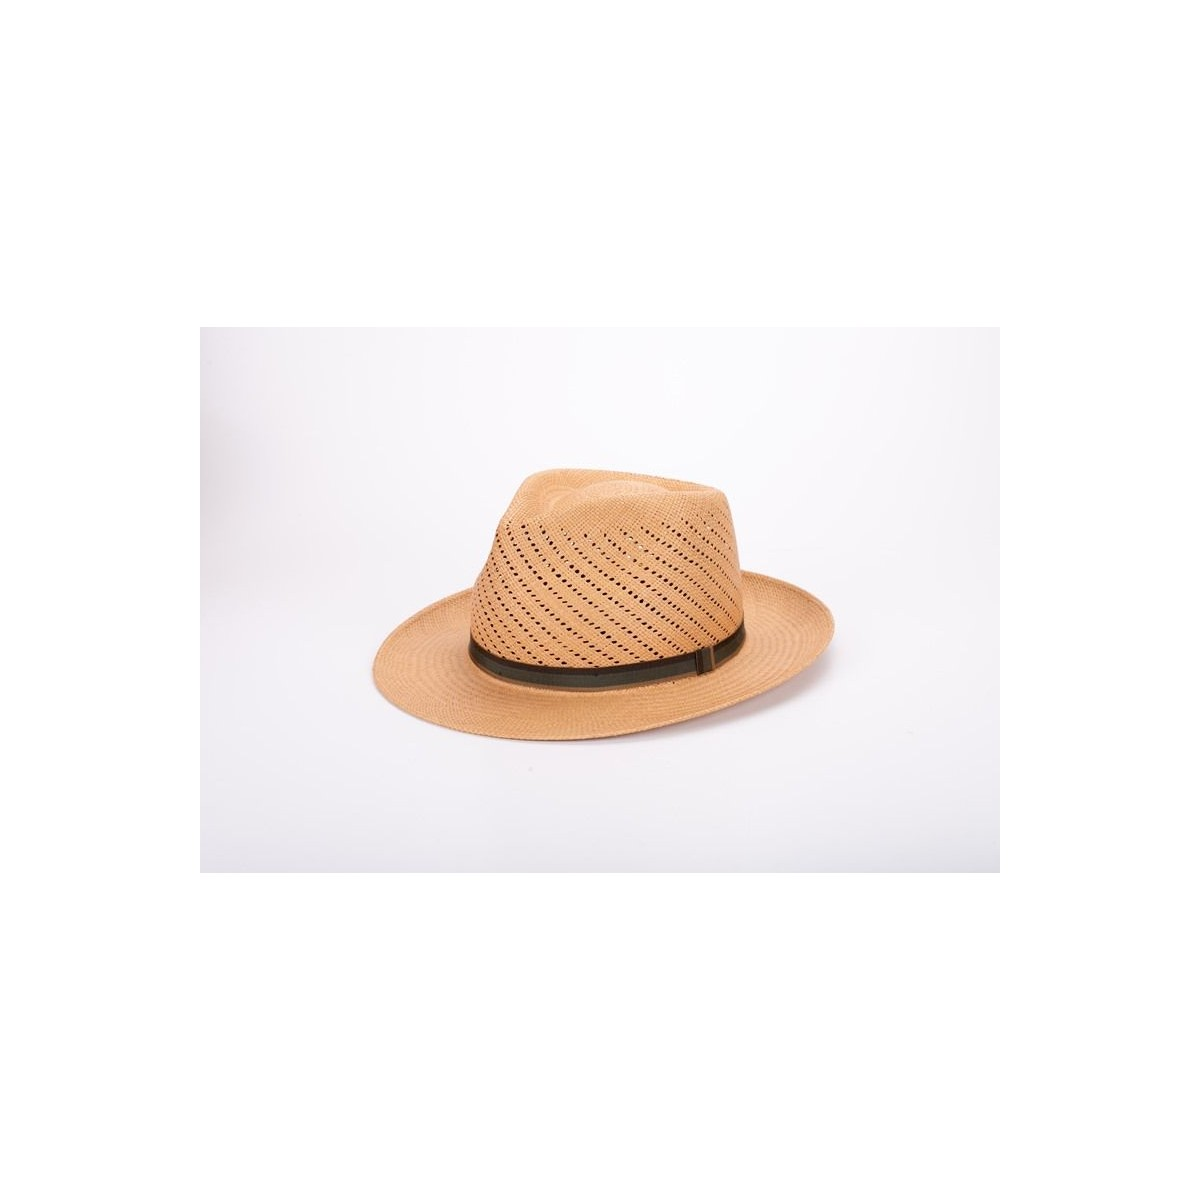 sombrero-hombre-panama-morevi-paja-toquillera-habano-Fernandez-y-Roche-1